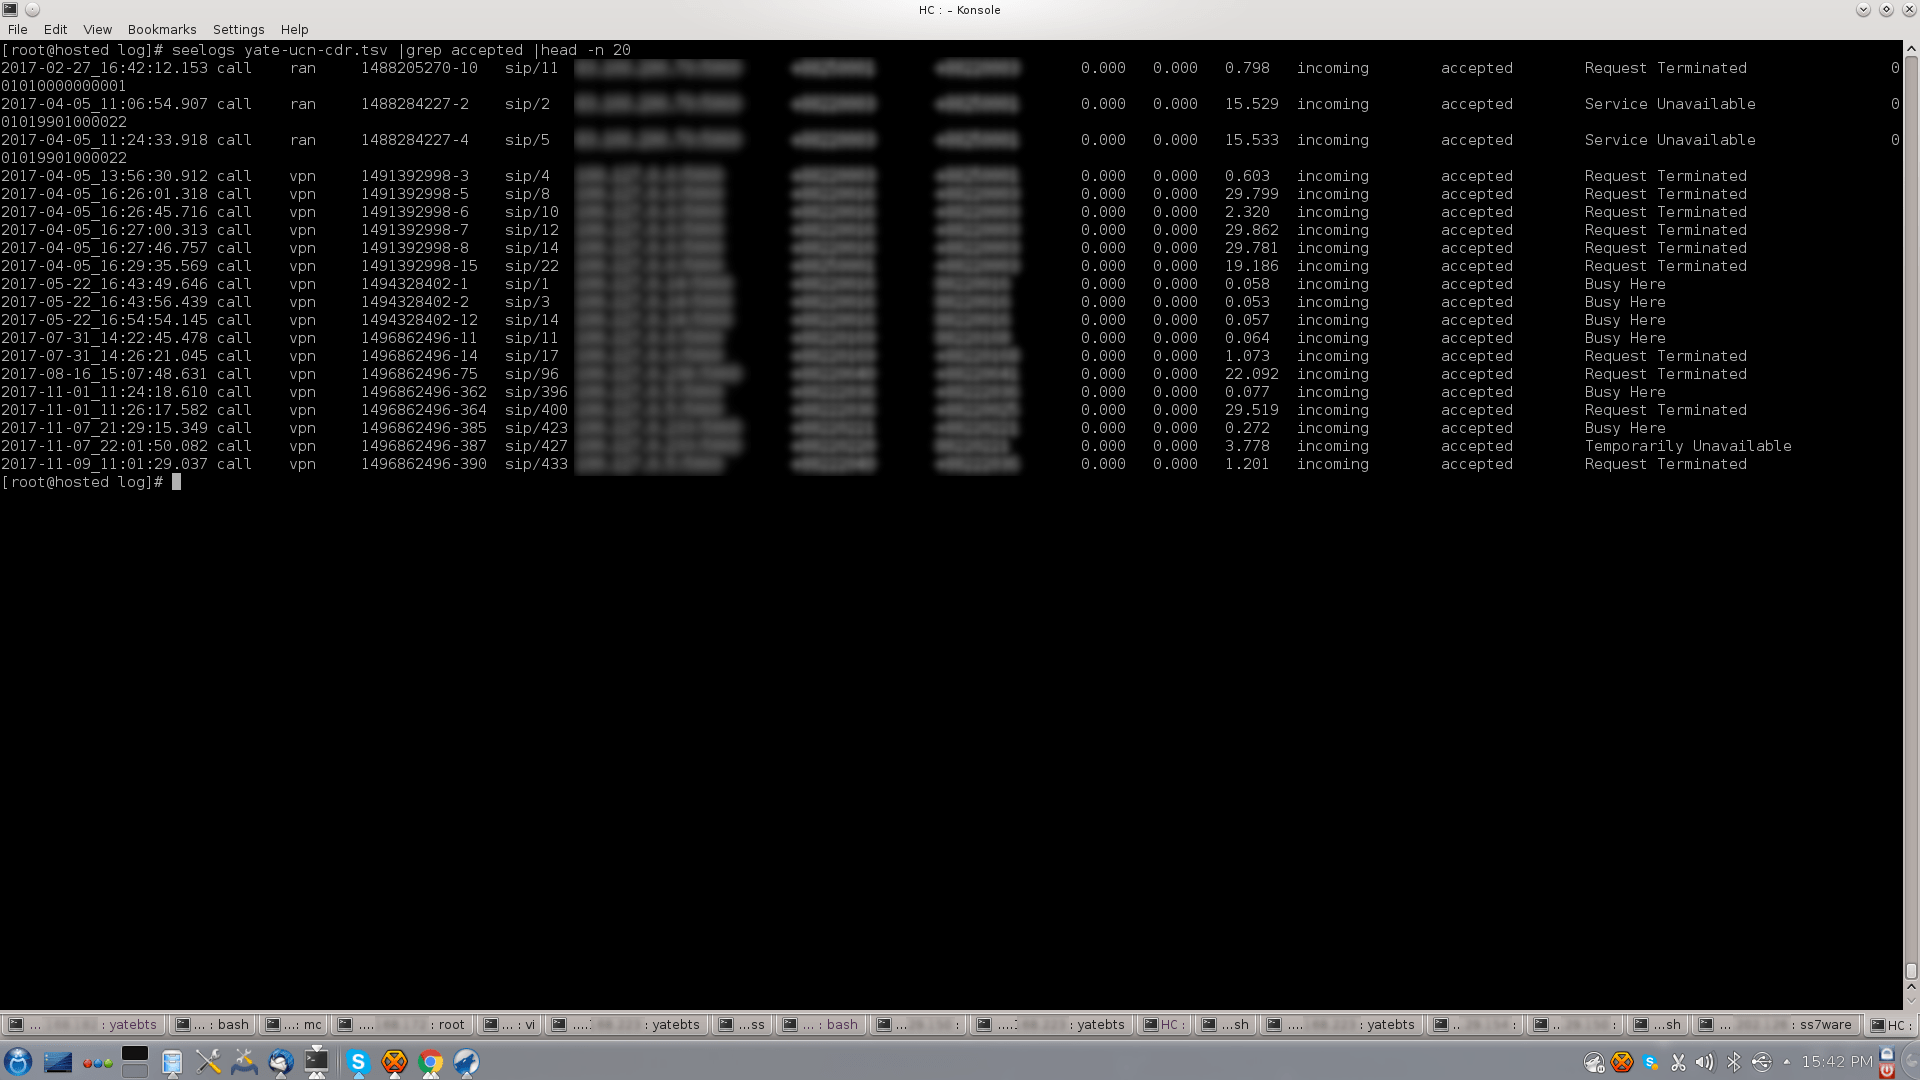 CDR Screenshot from Core Network YateUCN